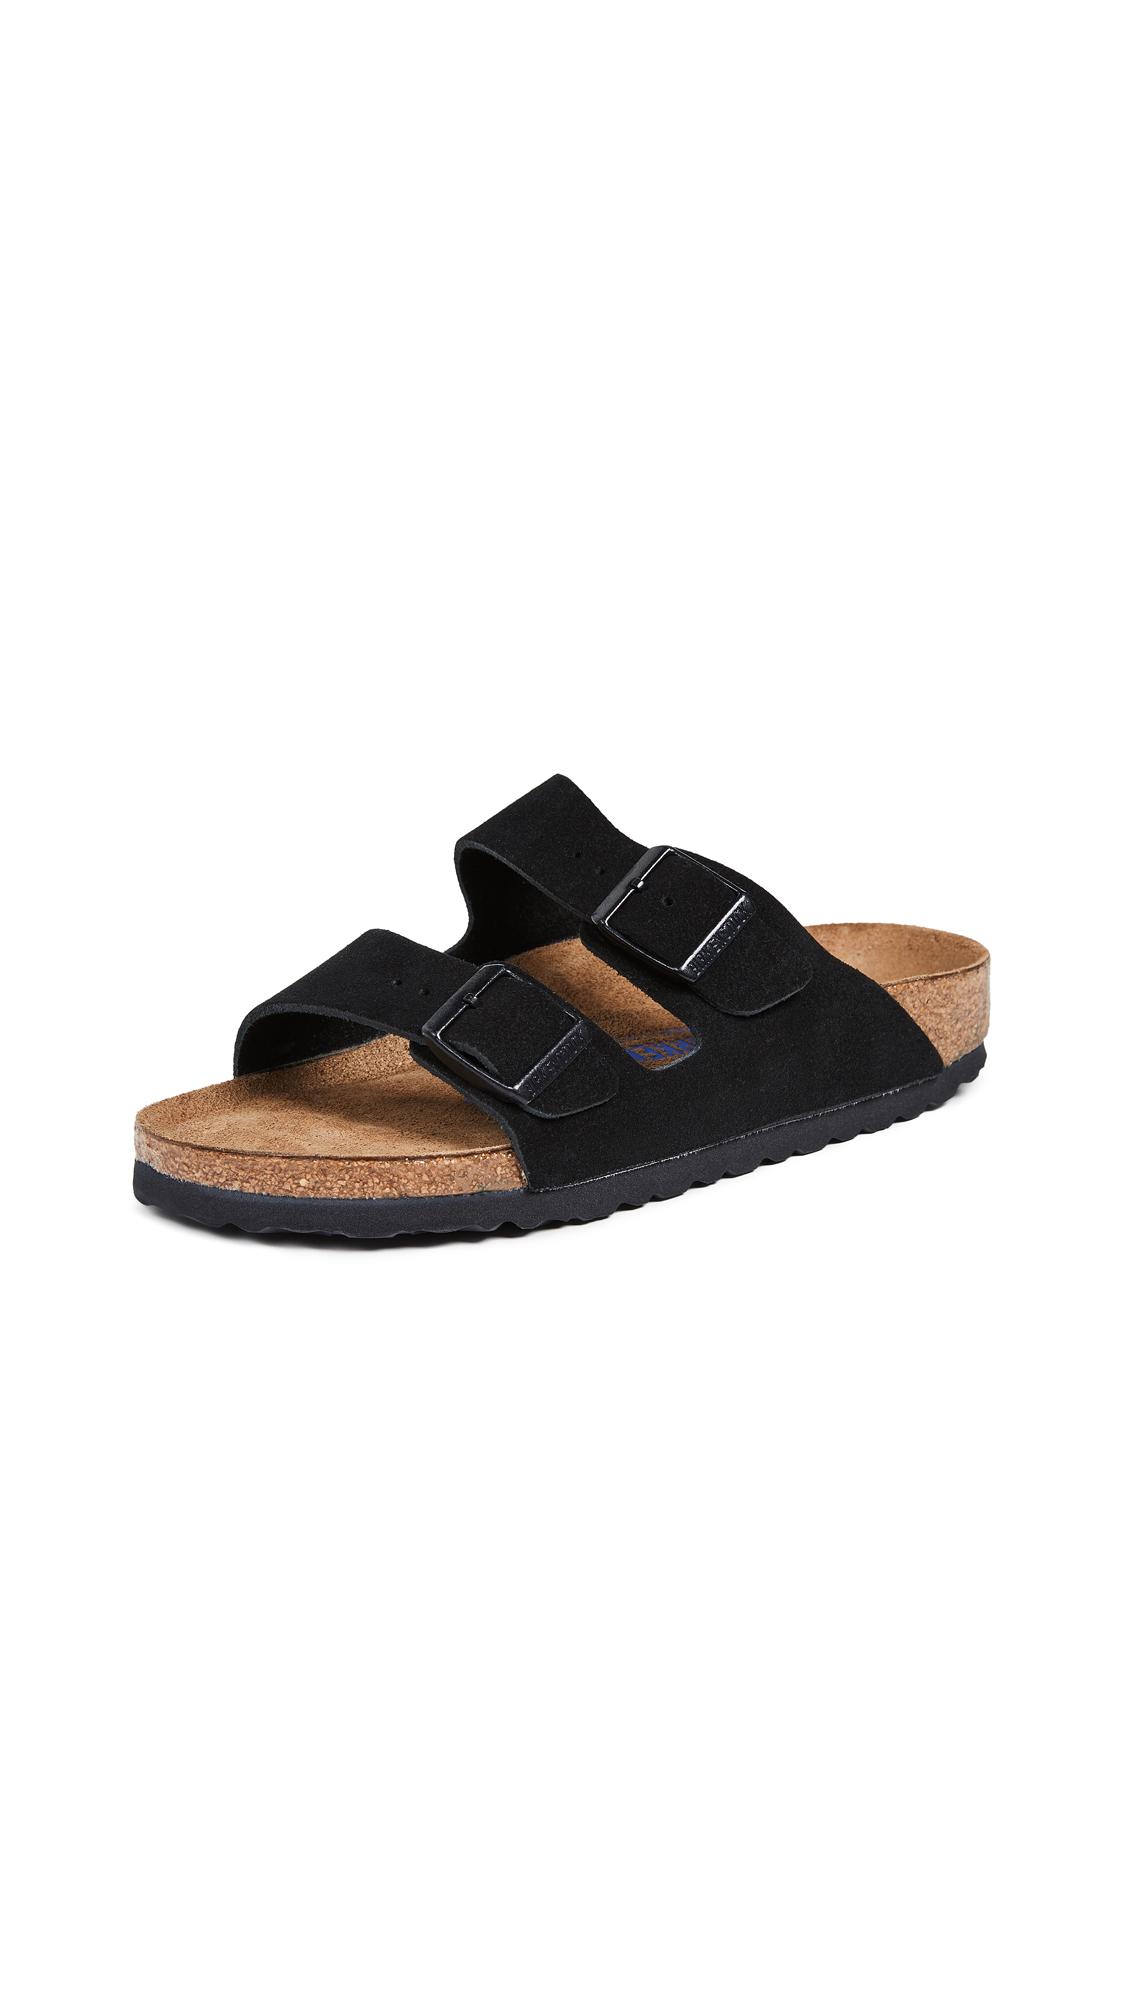 Birkenstock Arizona SFB Sandals - Black